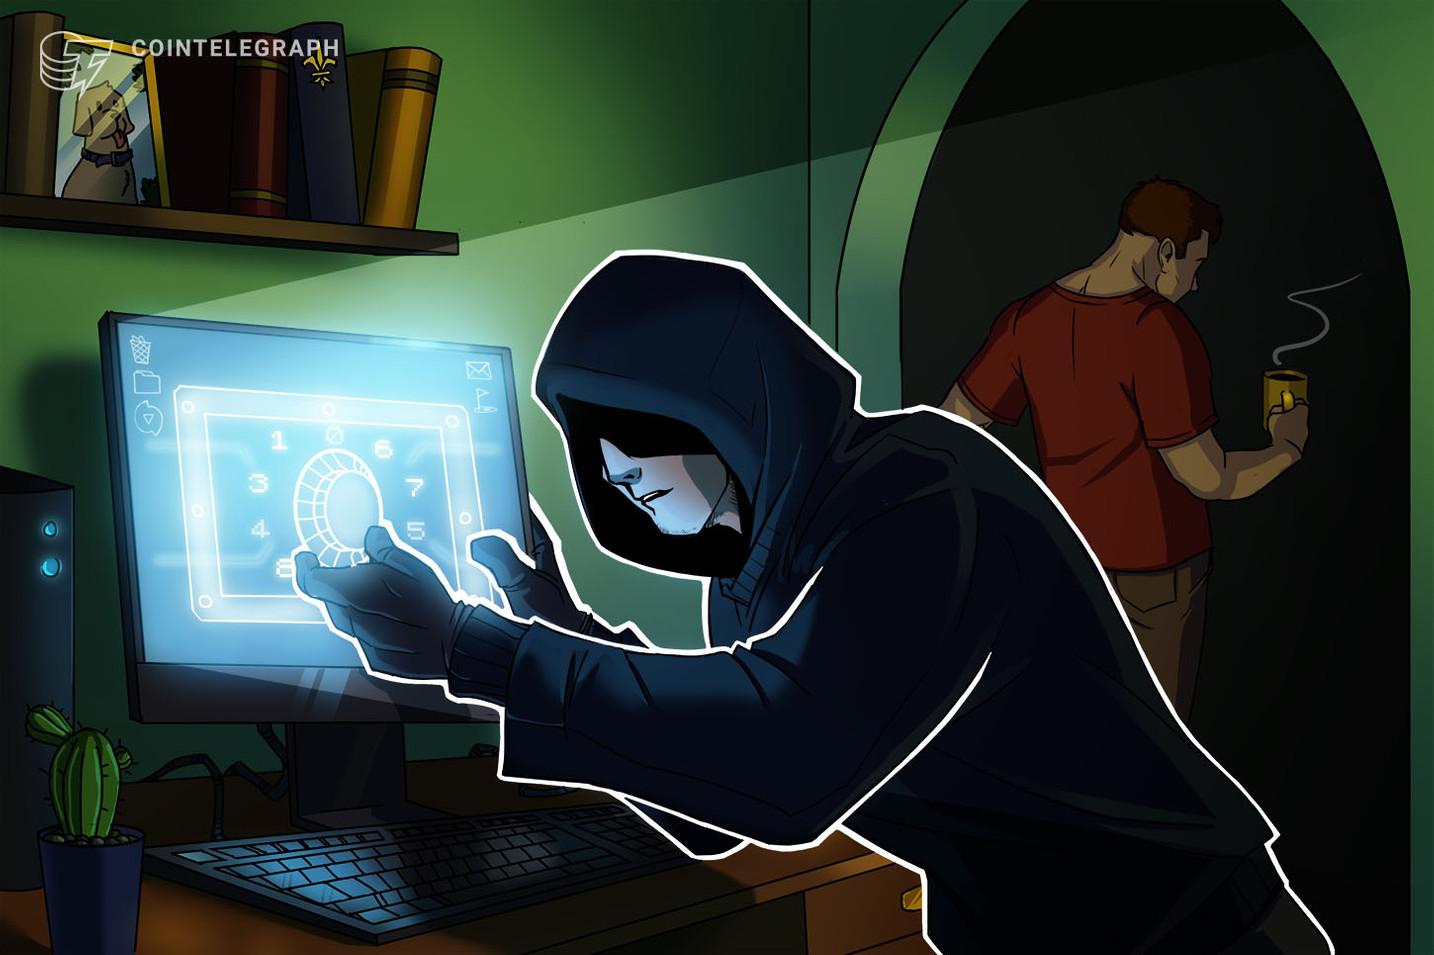 Kryptobörse UpBit: Phishing-Email-Betrug stammt aus Nordkorea